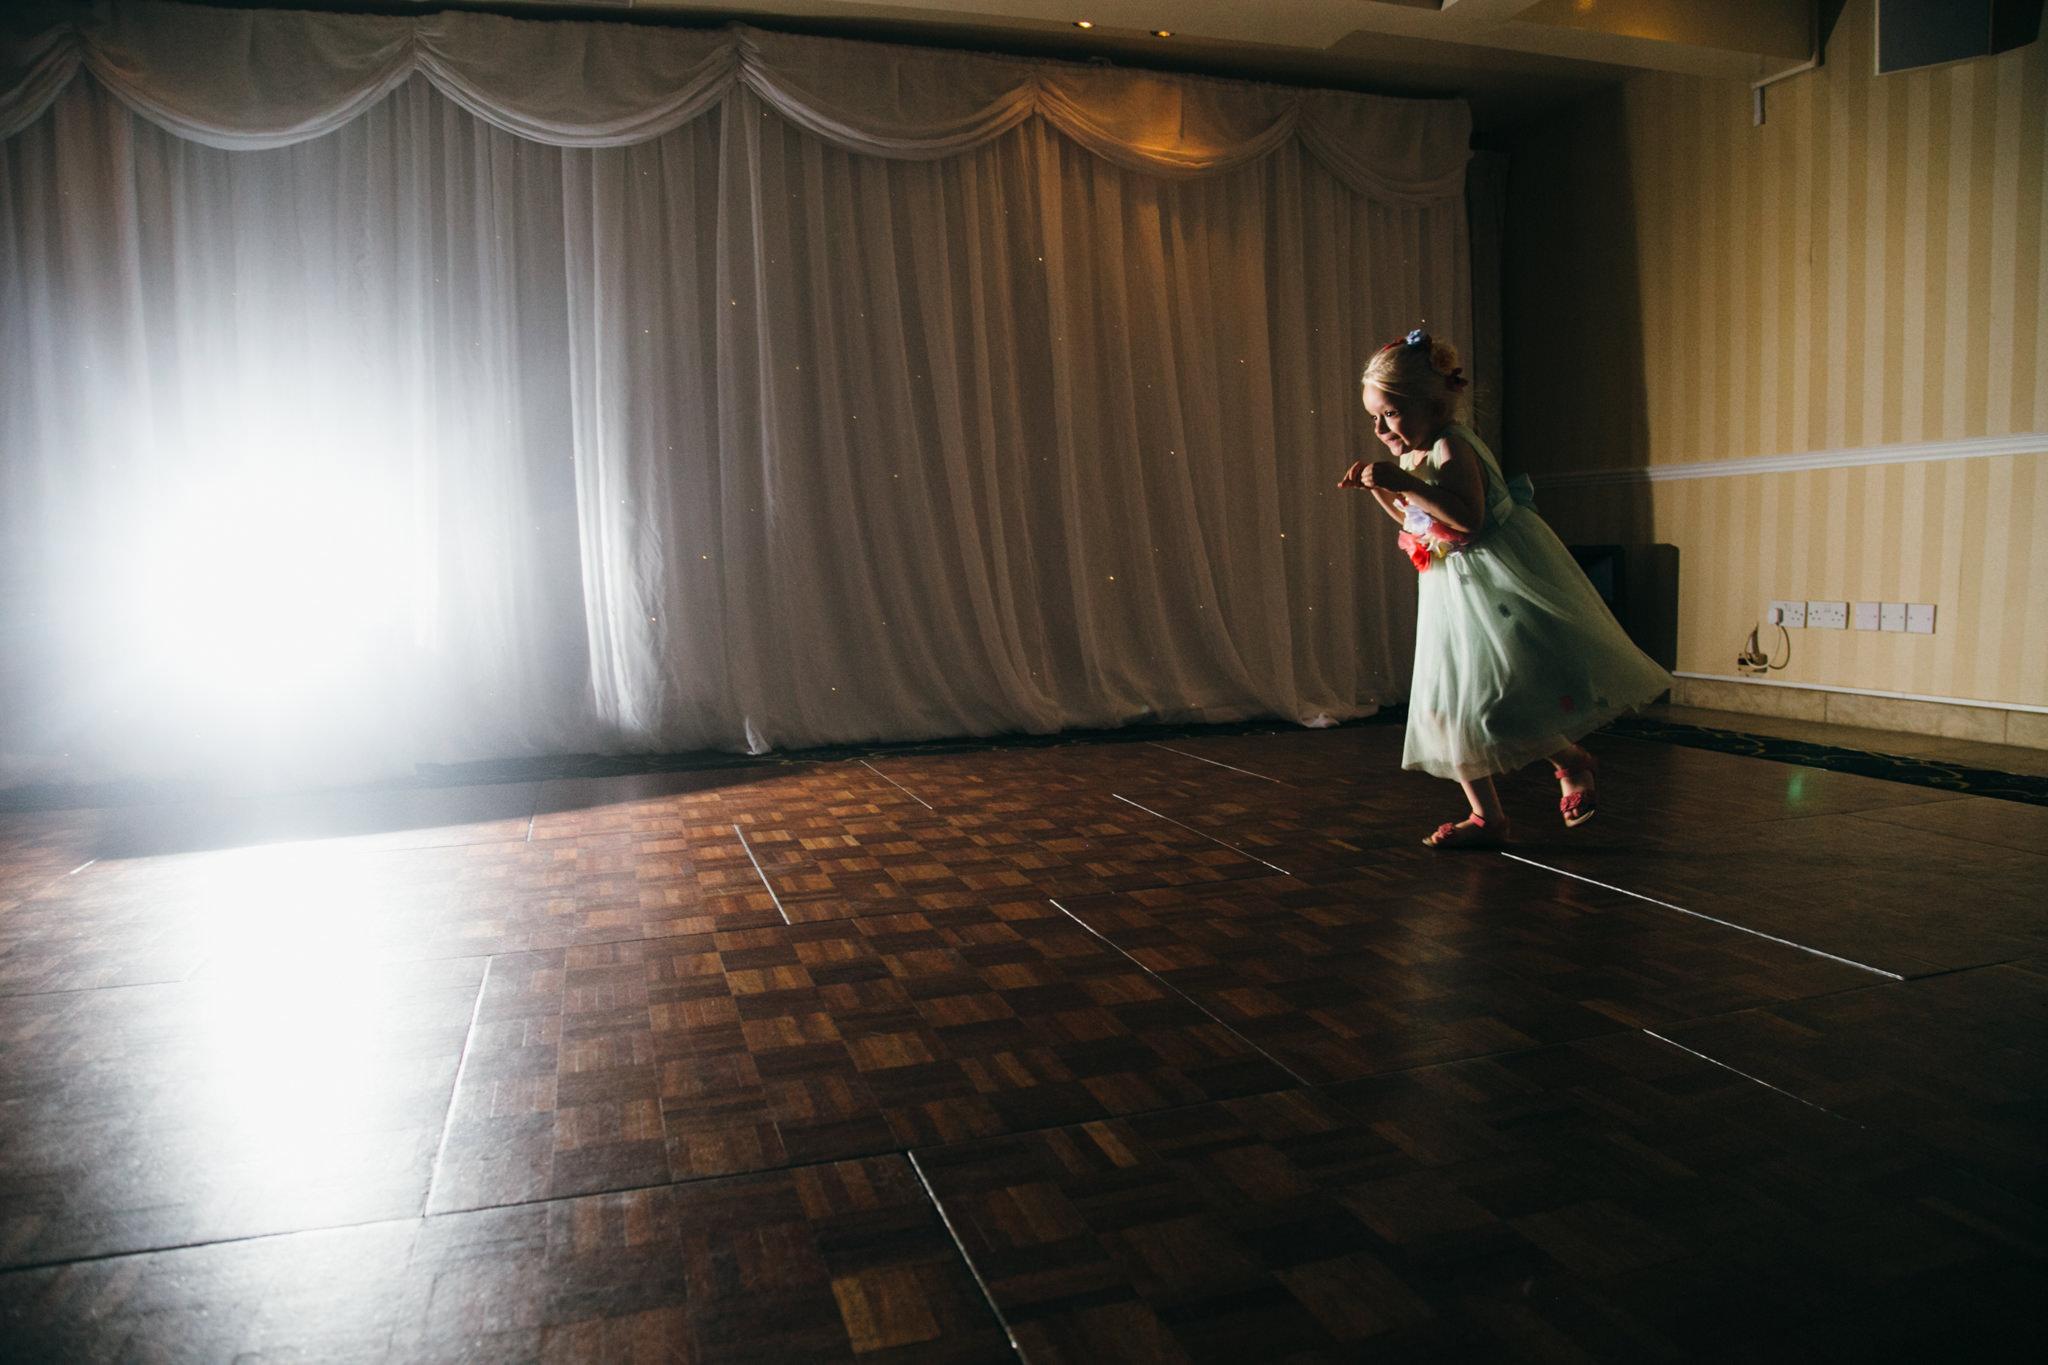 documentary wedding photography london and brighton speeches hampton court palace